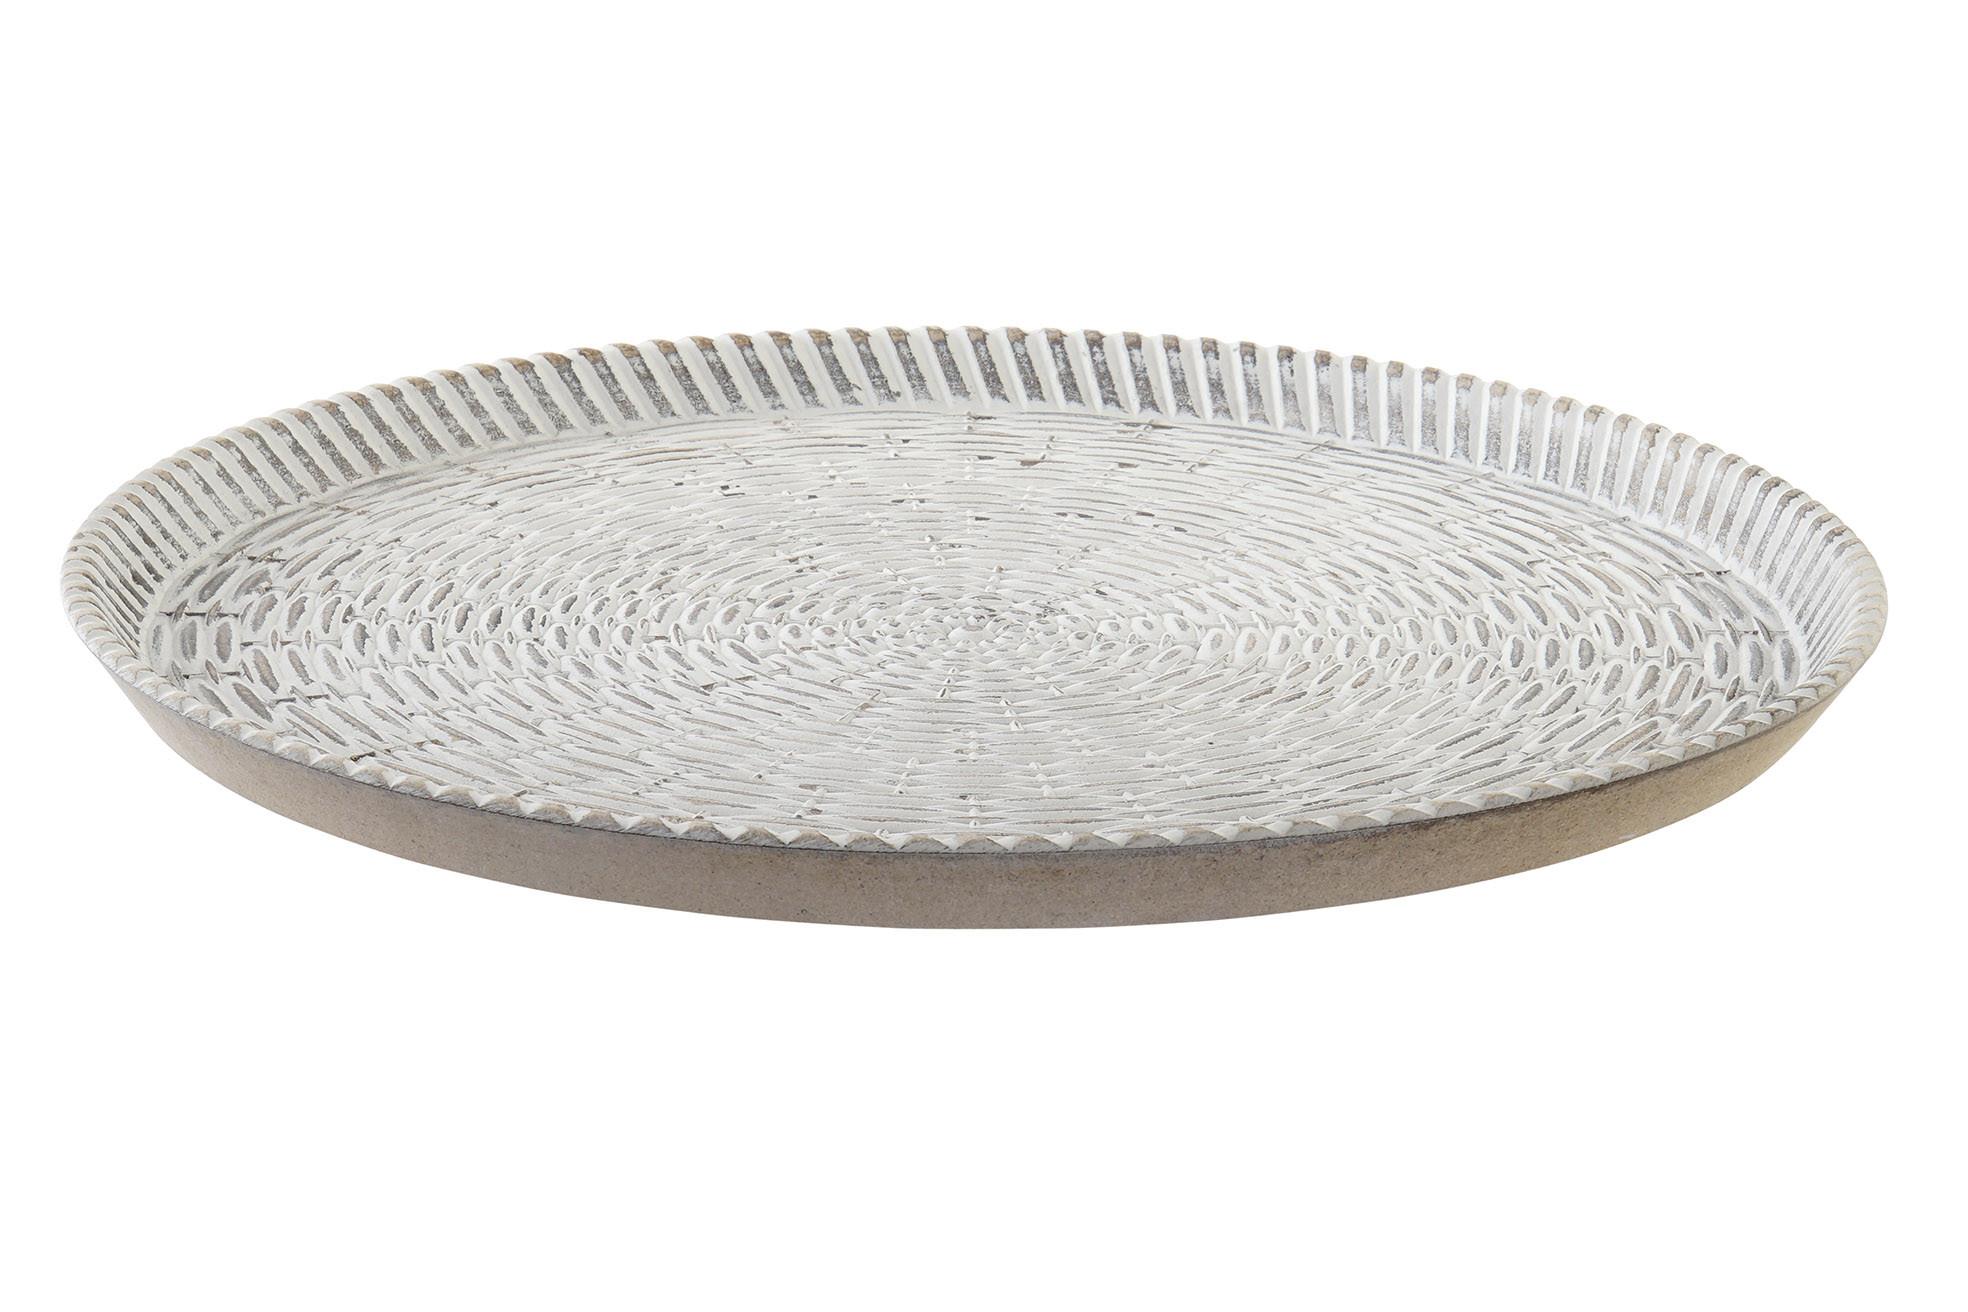 Center Table, Decorative Wooden Tray round White Interior Decoration Original/Elegante39x39x2,5 cm - Home and More